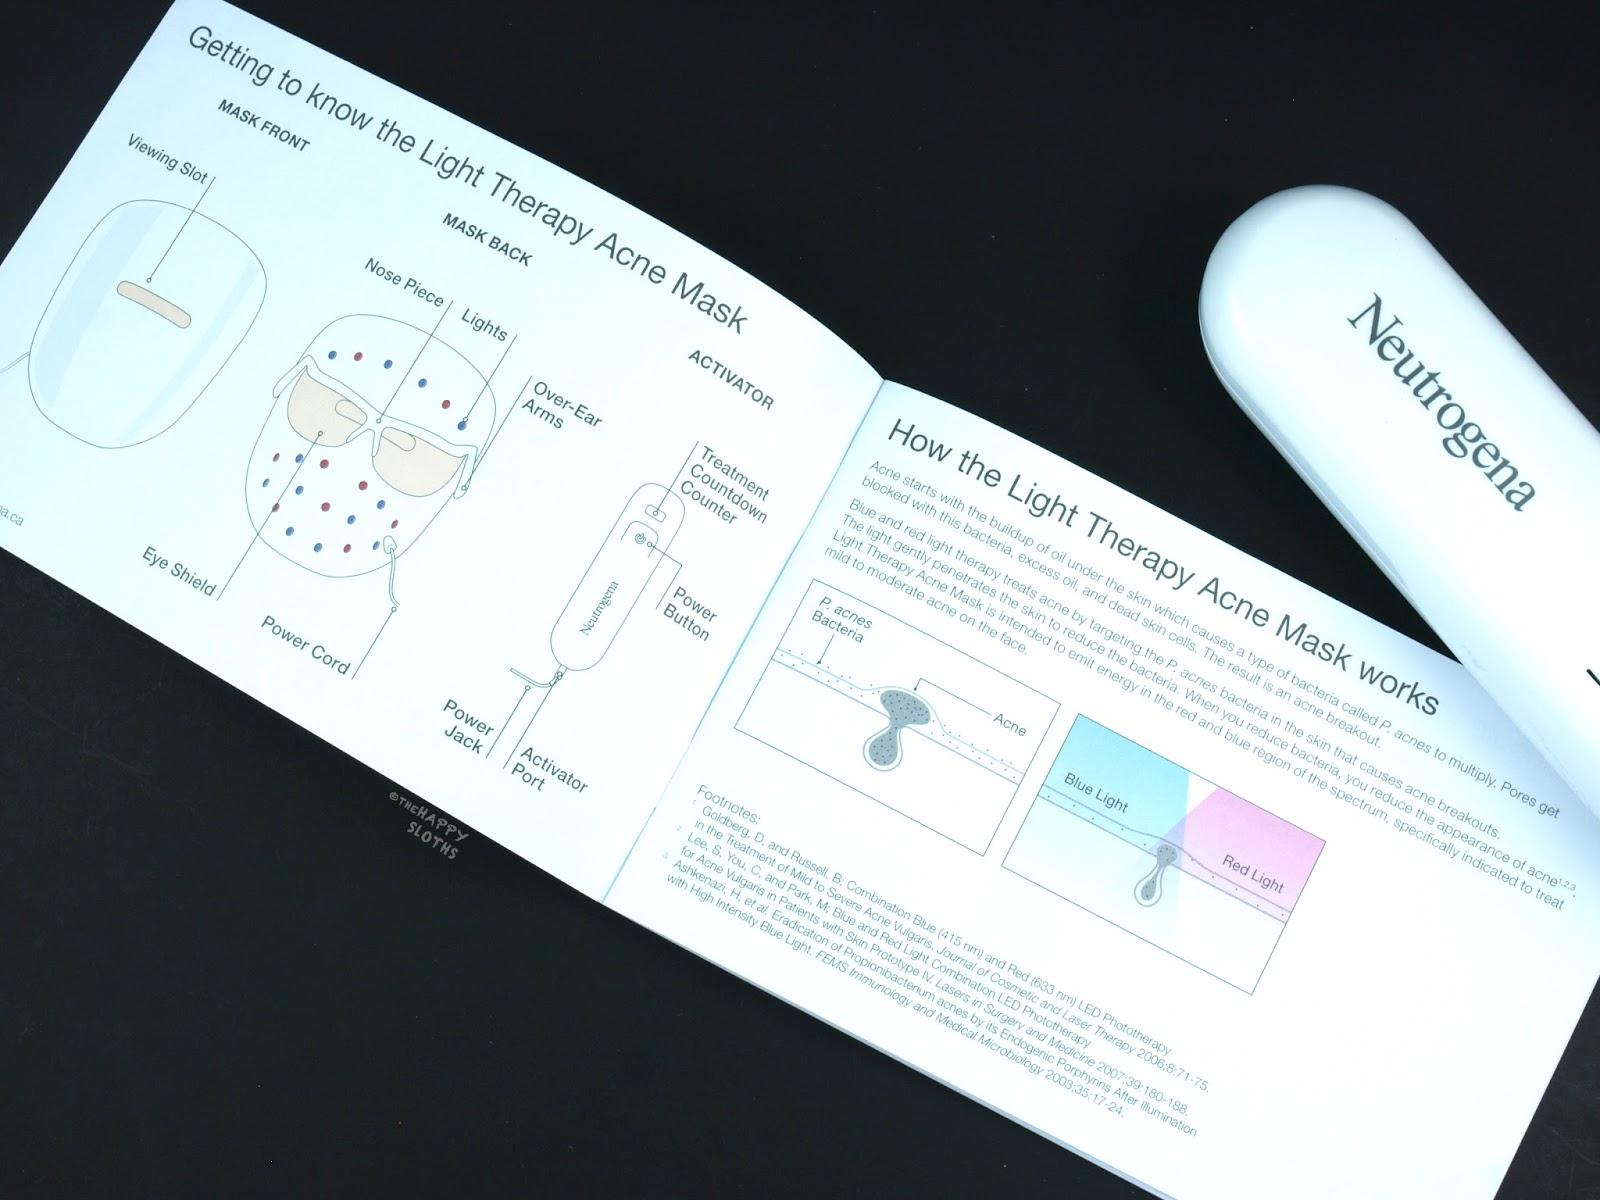 Neutrogena Light Therapy Acne Mask: Review